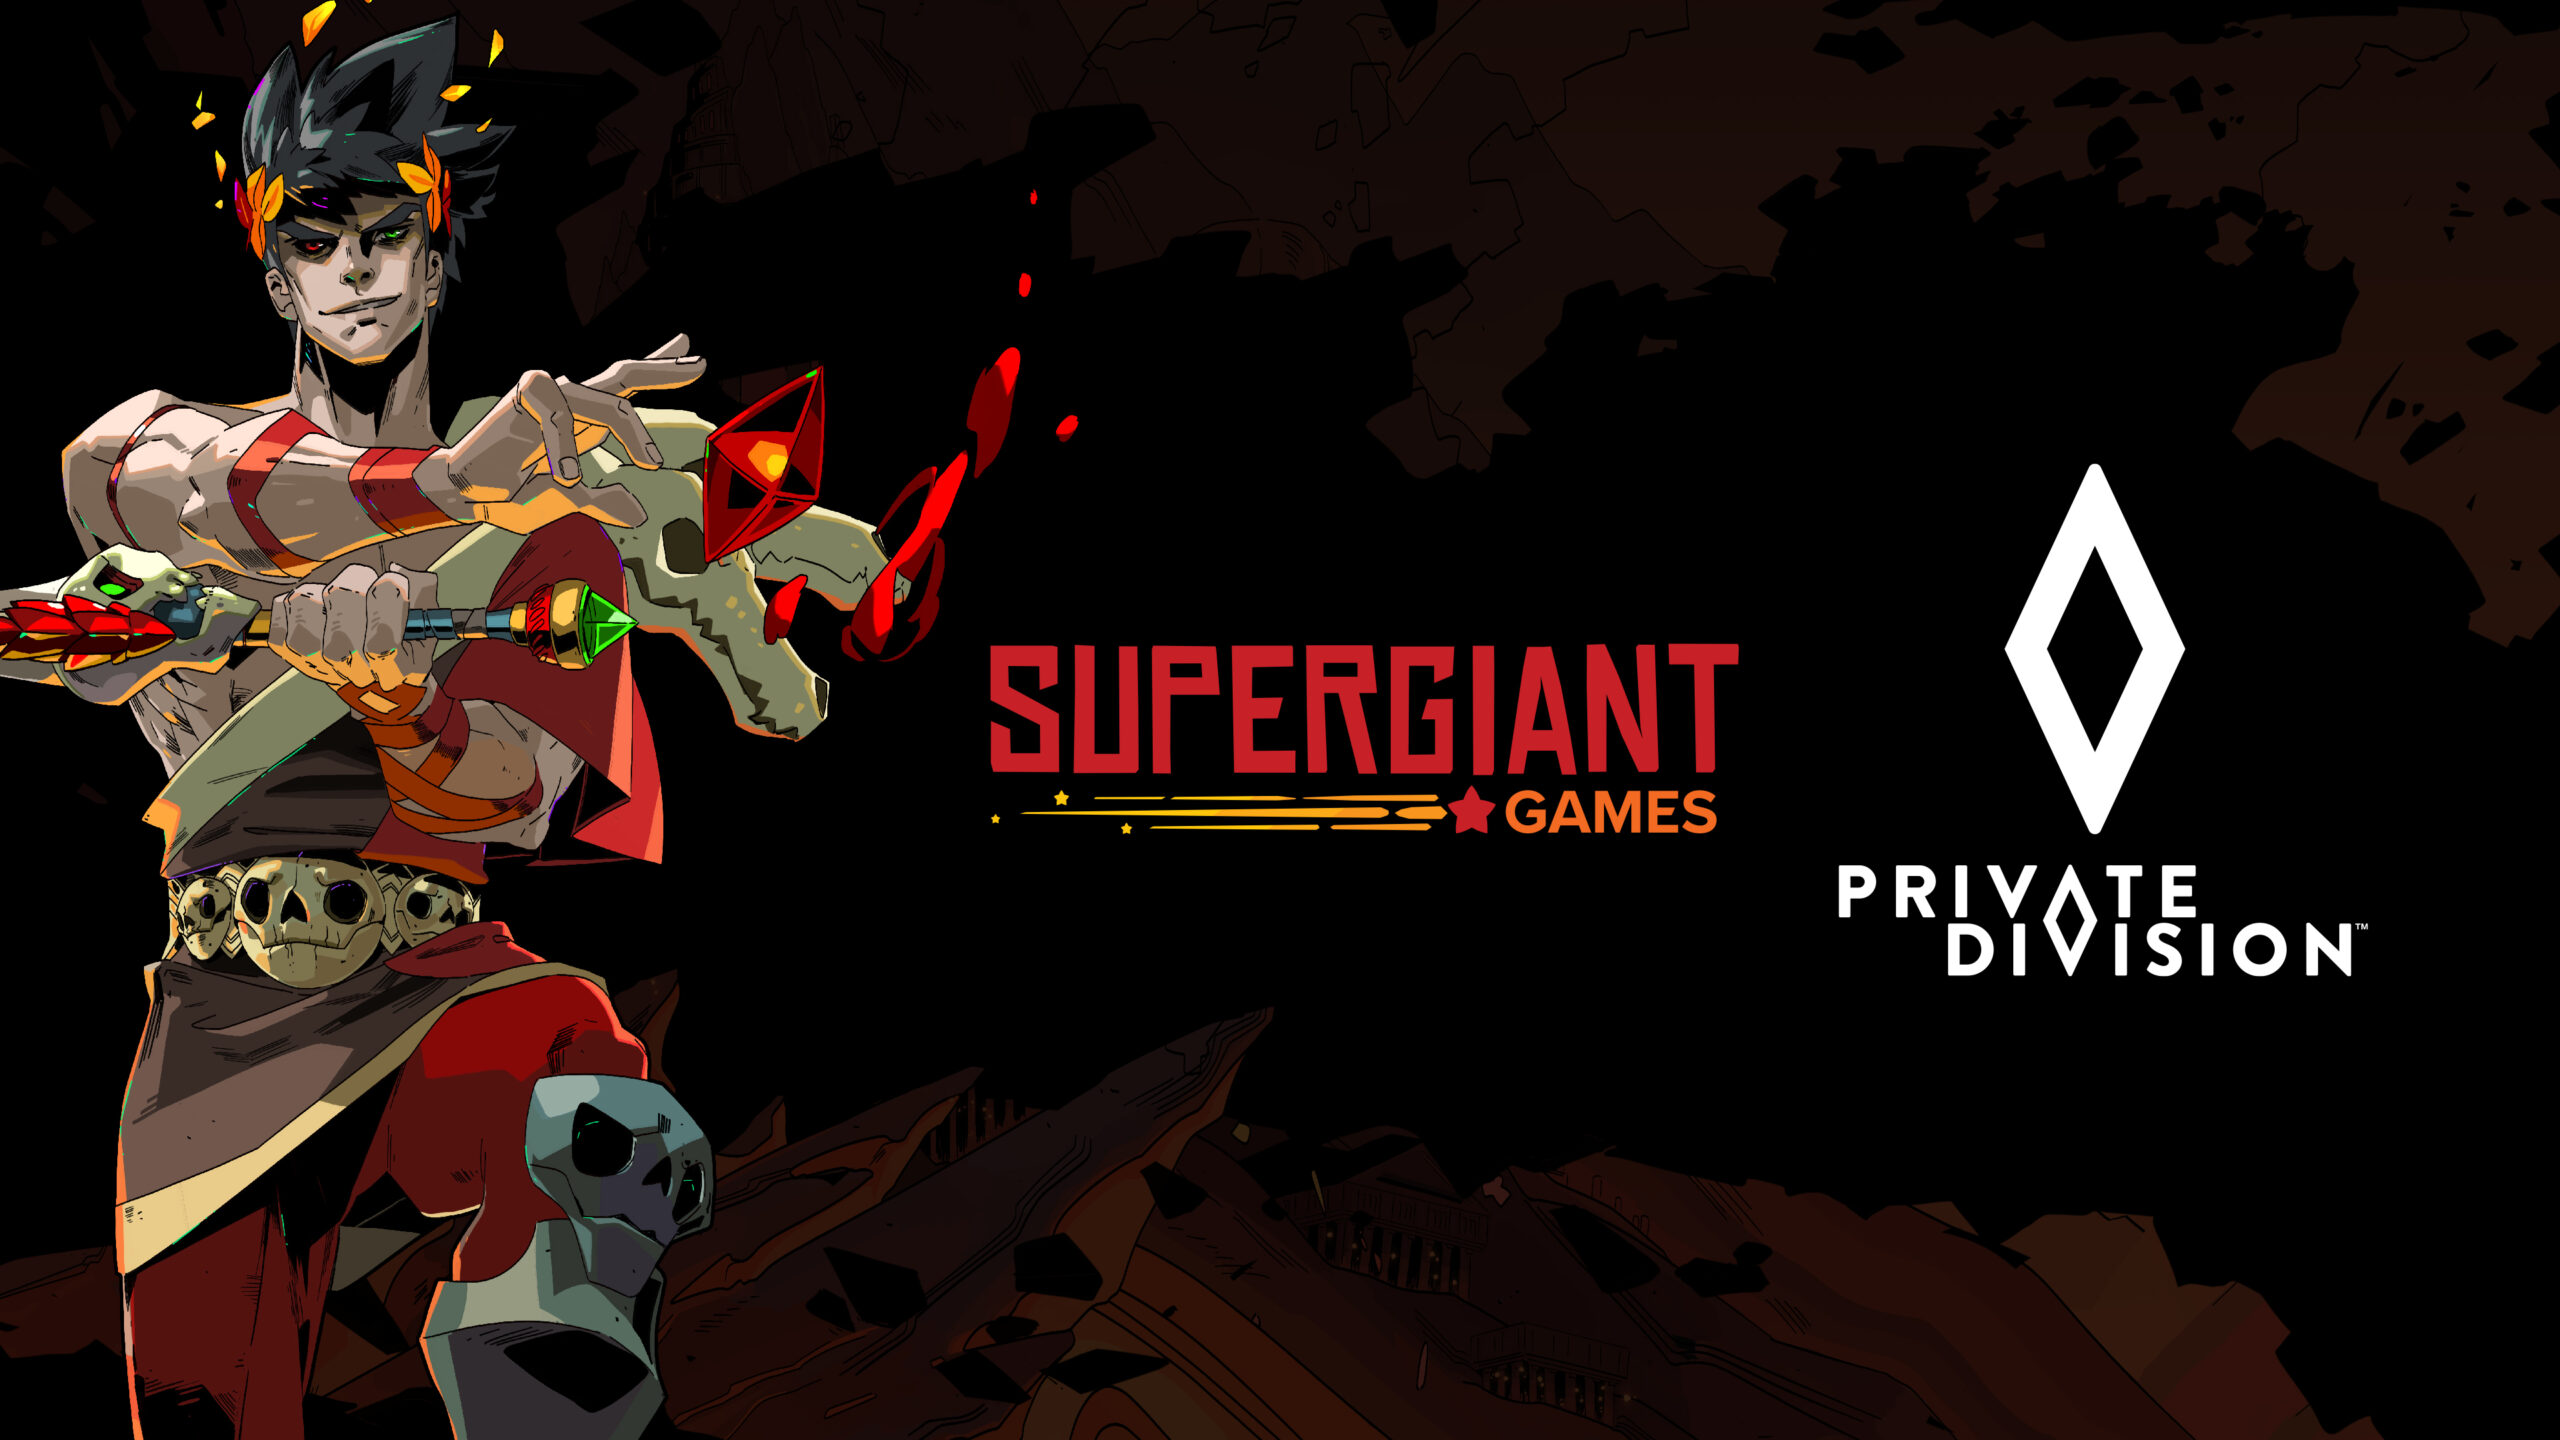 Supergiant Games & Private Division Partnership